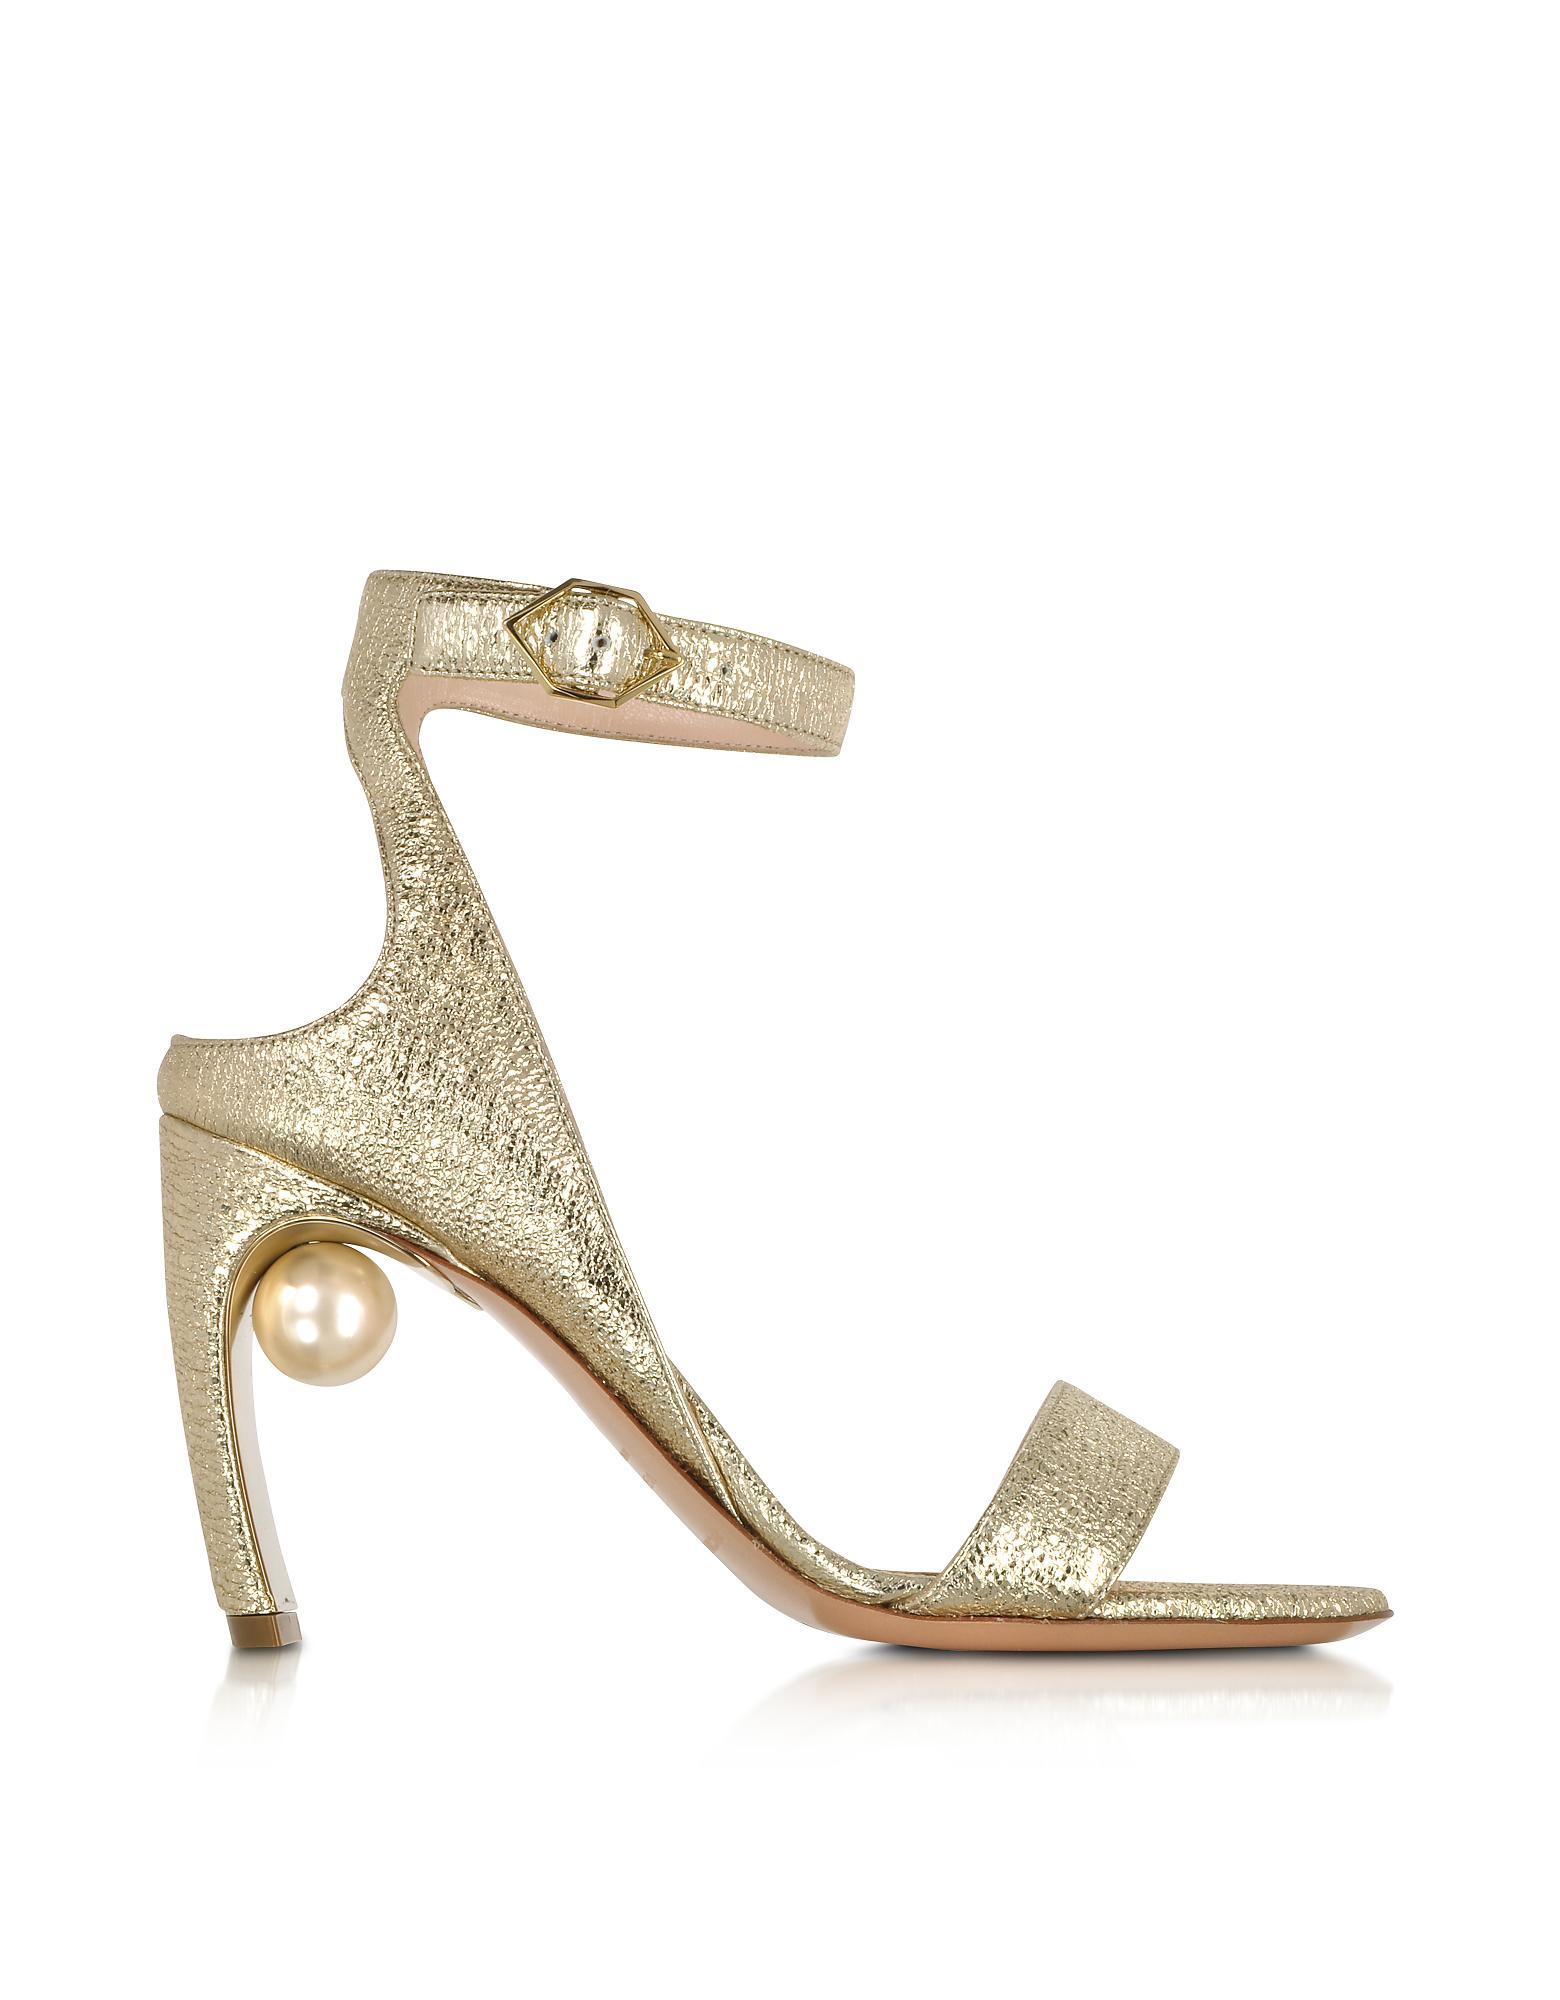 Silver Lola Pearl 90 Leather sandals - Metallic Nicholas Kirkwood e8CyN754